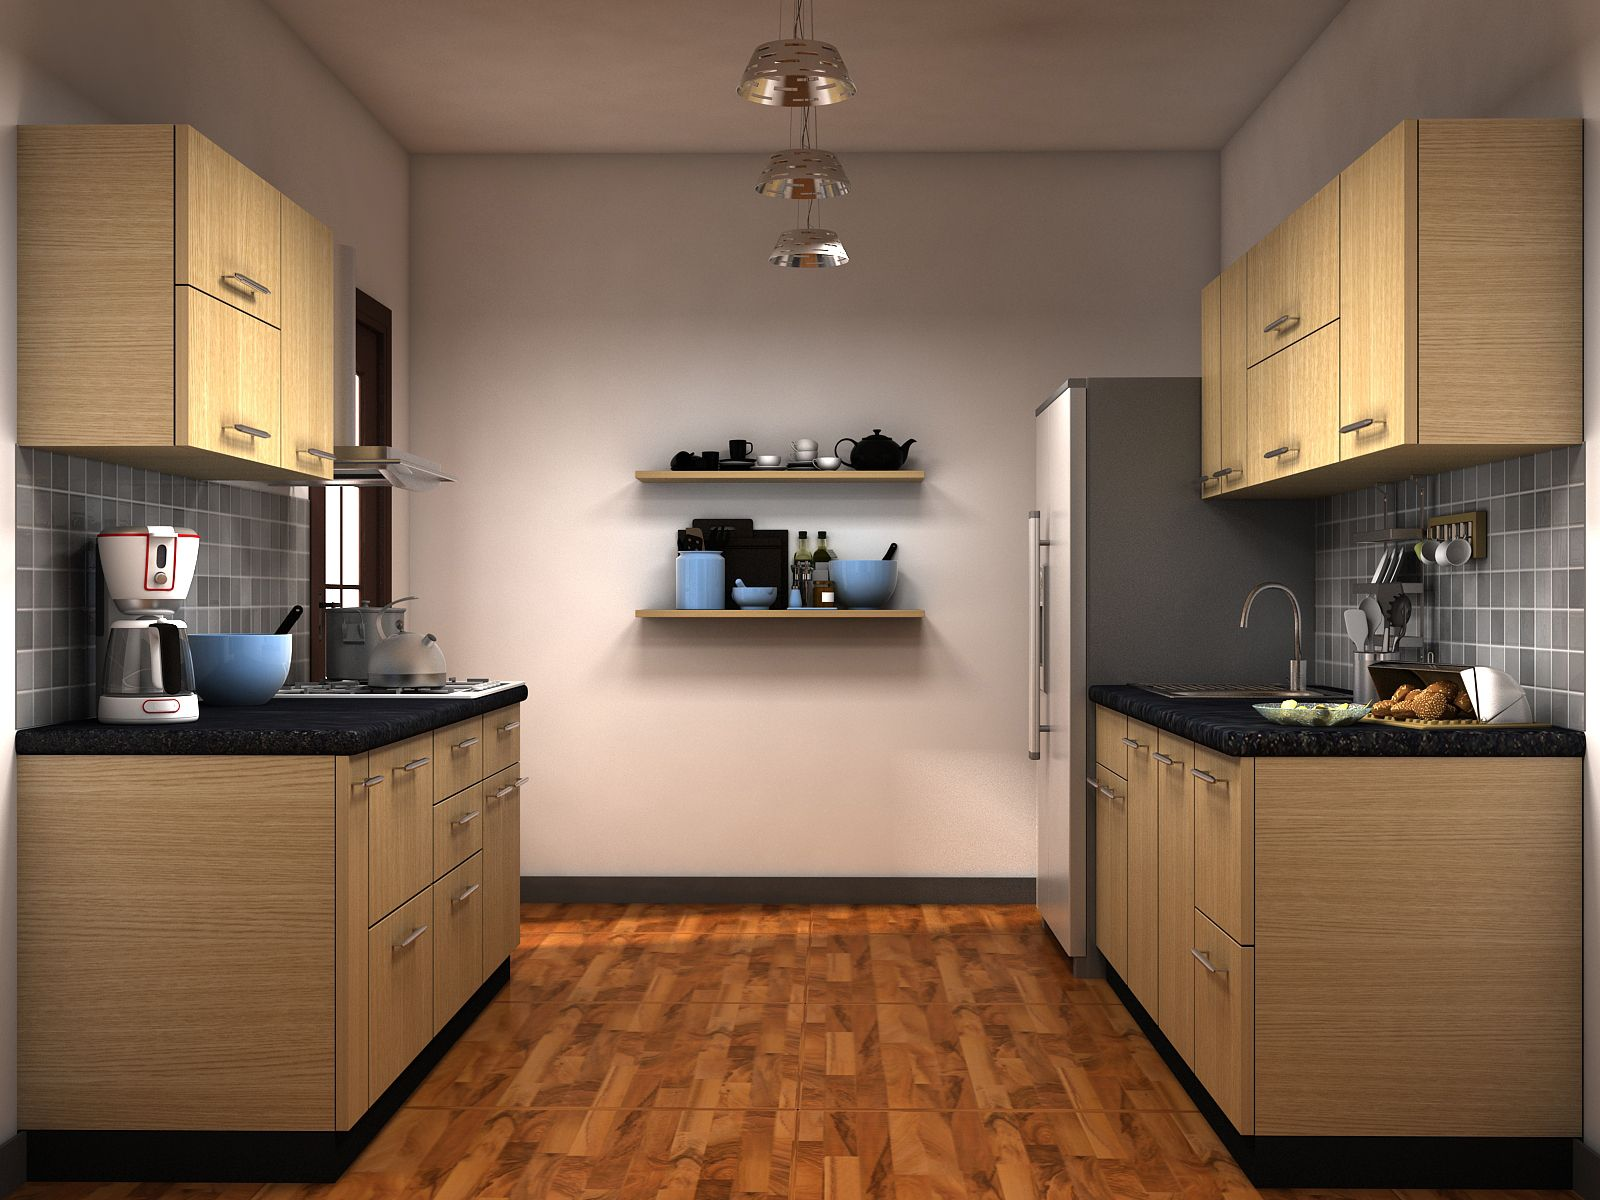 Kitchen Island Cabinets in Mangalore